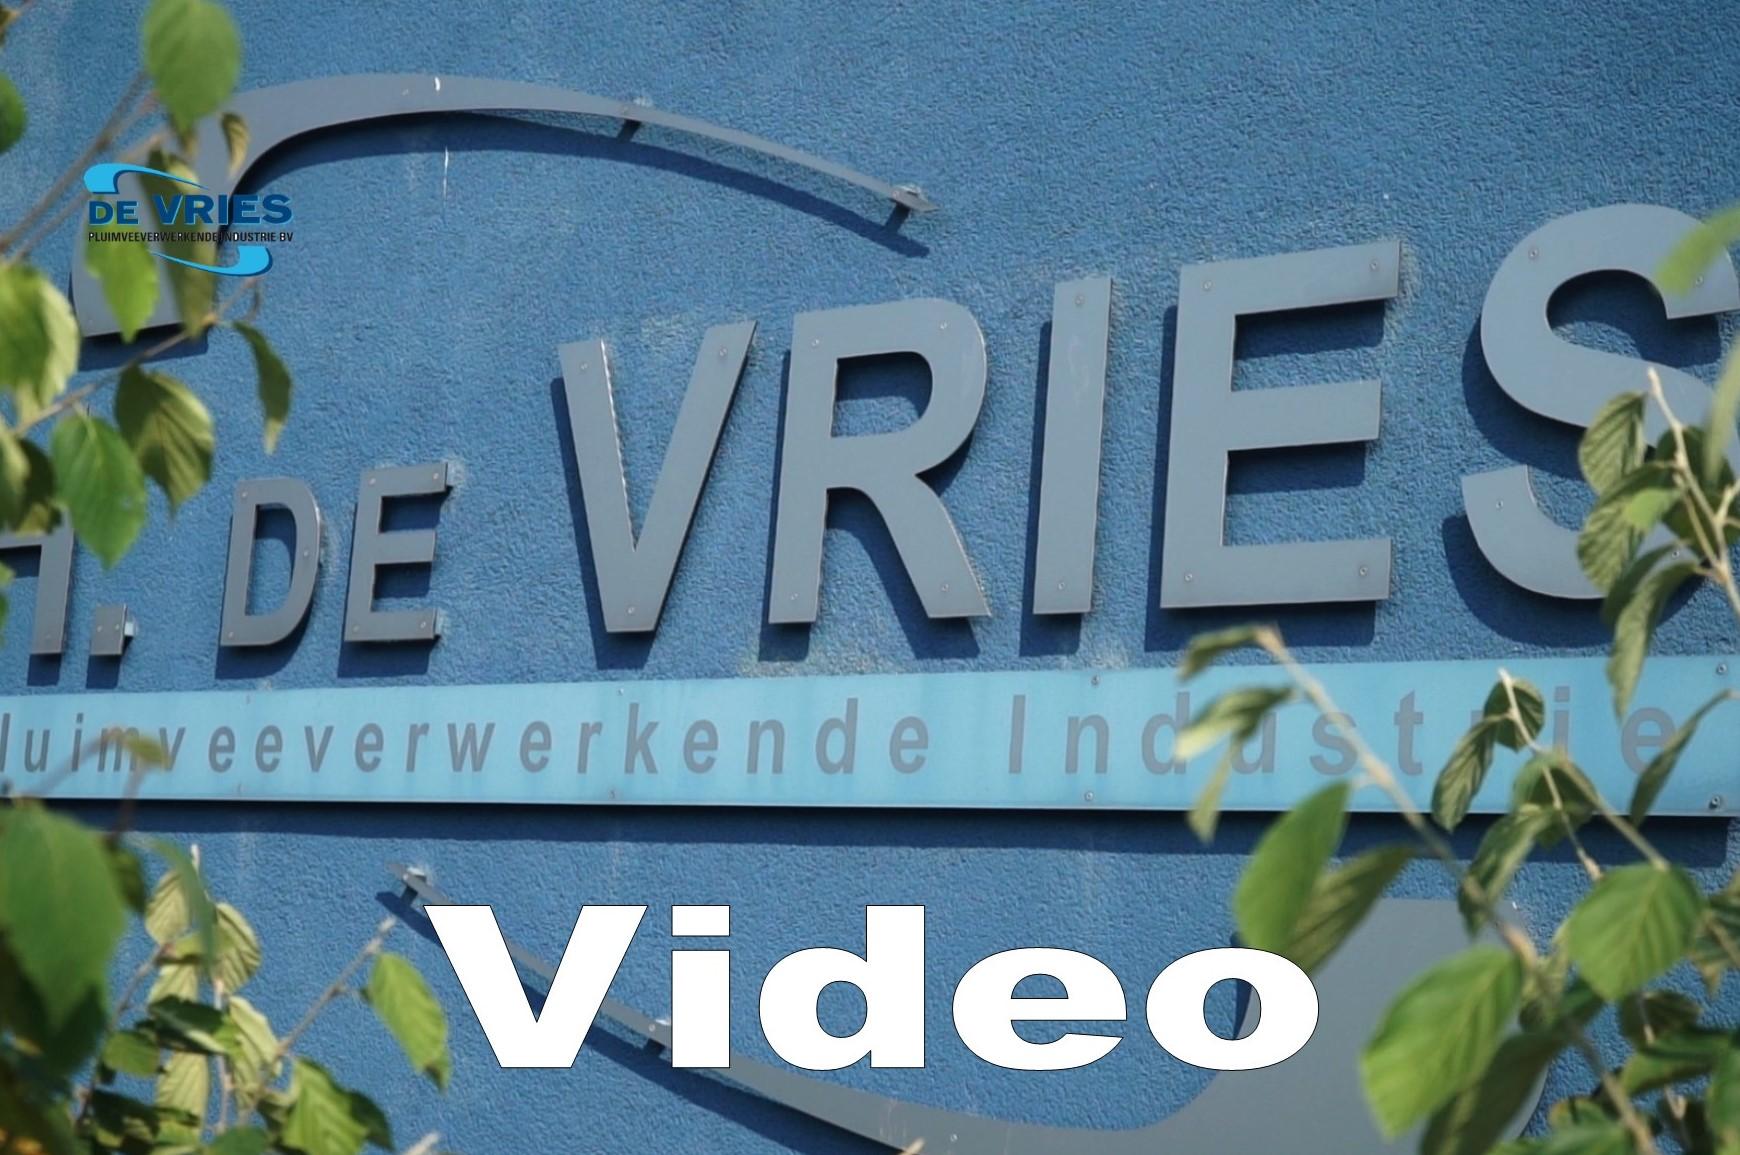 http://devriesnijkerk.nl/wp-content/uploads/2017/03/Video-1.jpg